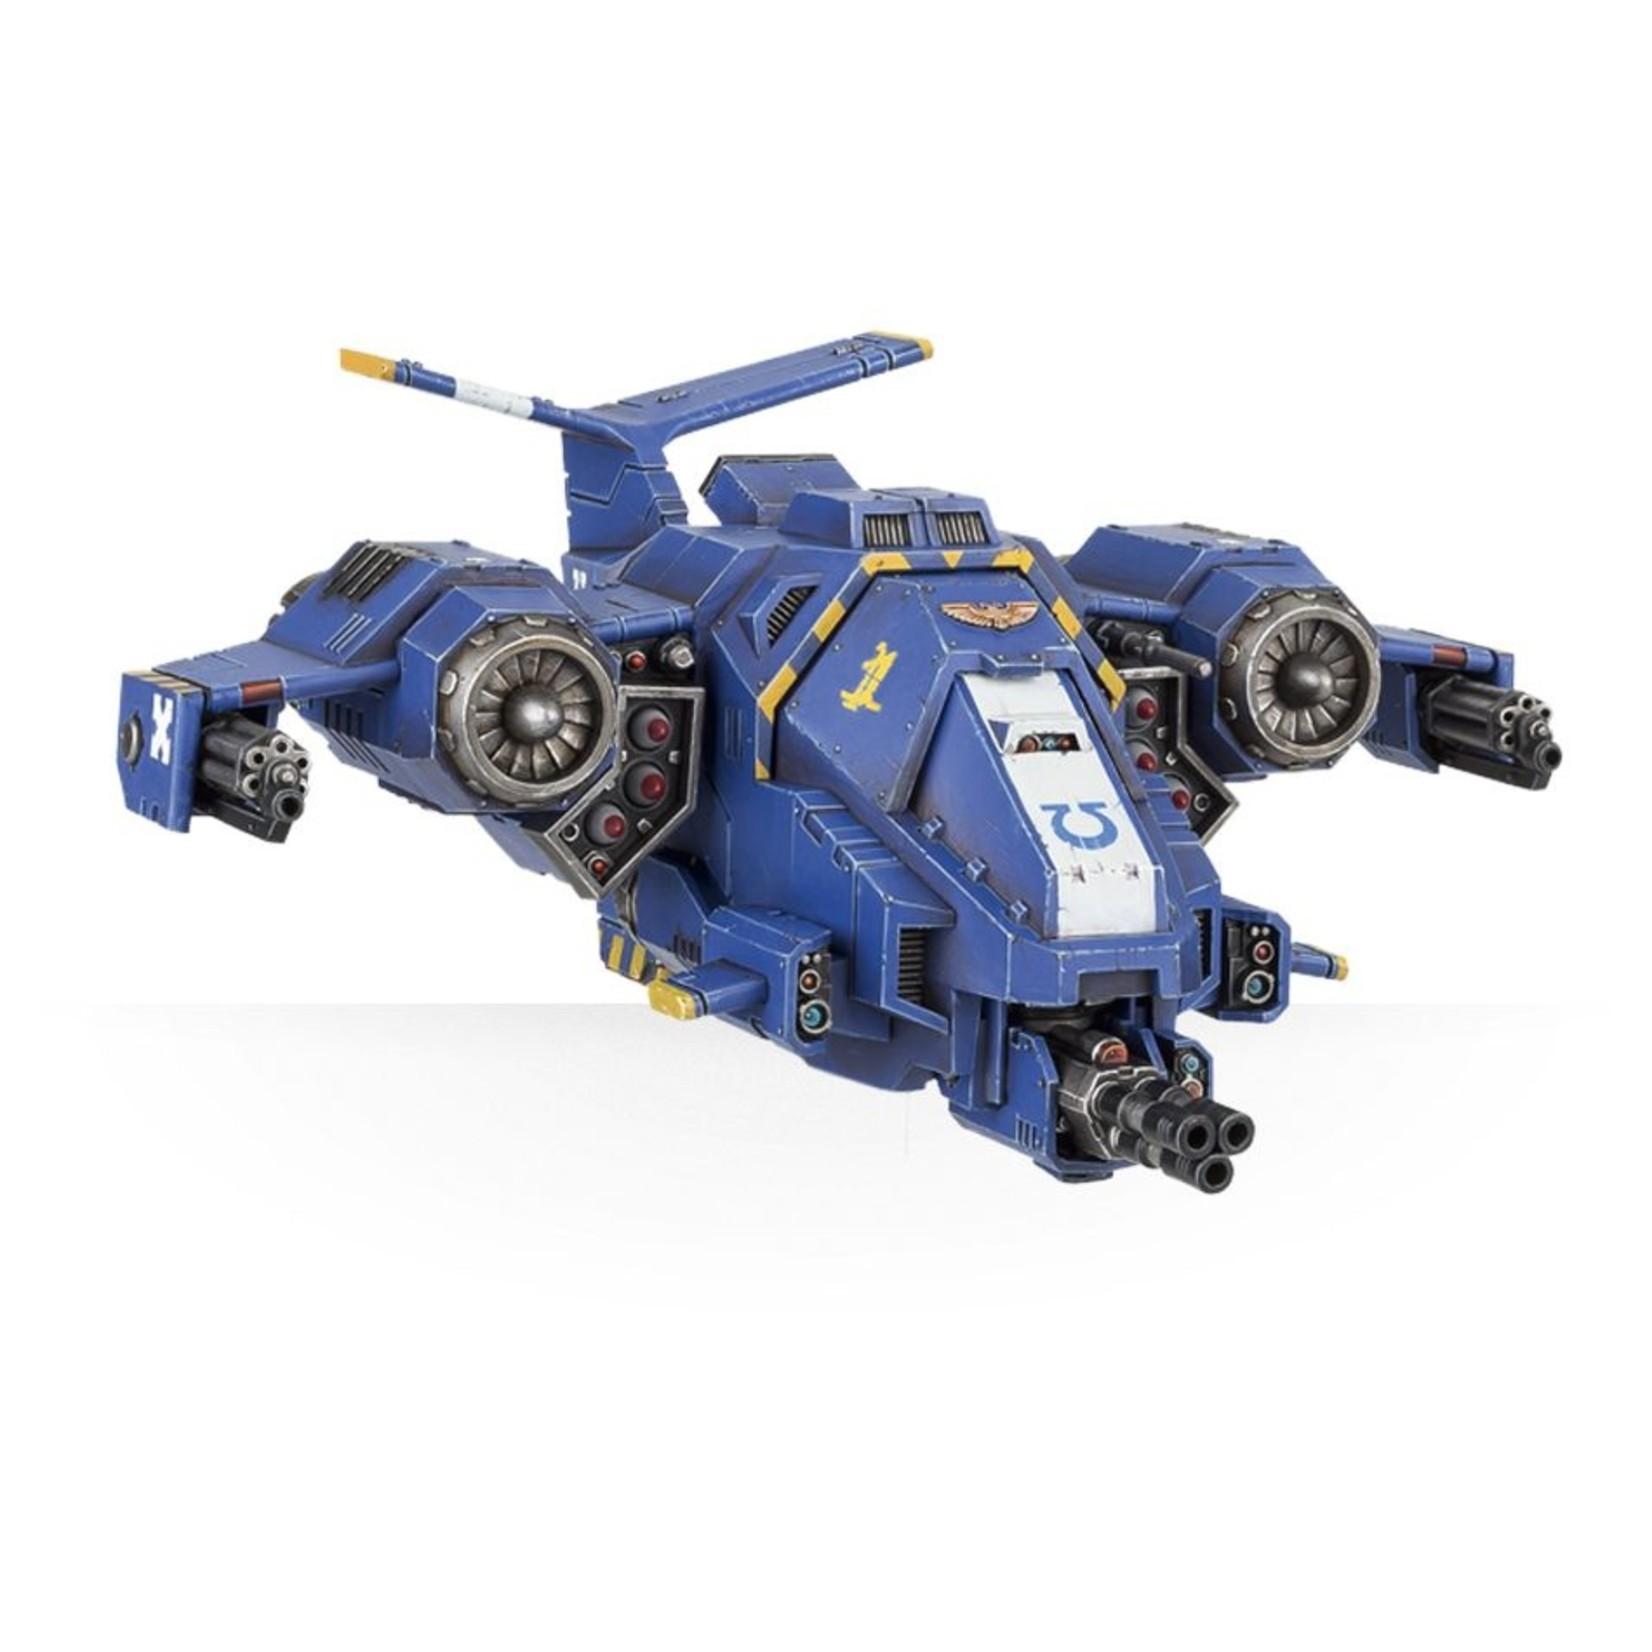 Games Workshop Stormhawk Interceptor/Stormtalon